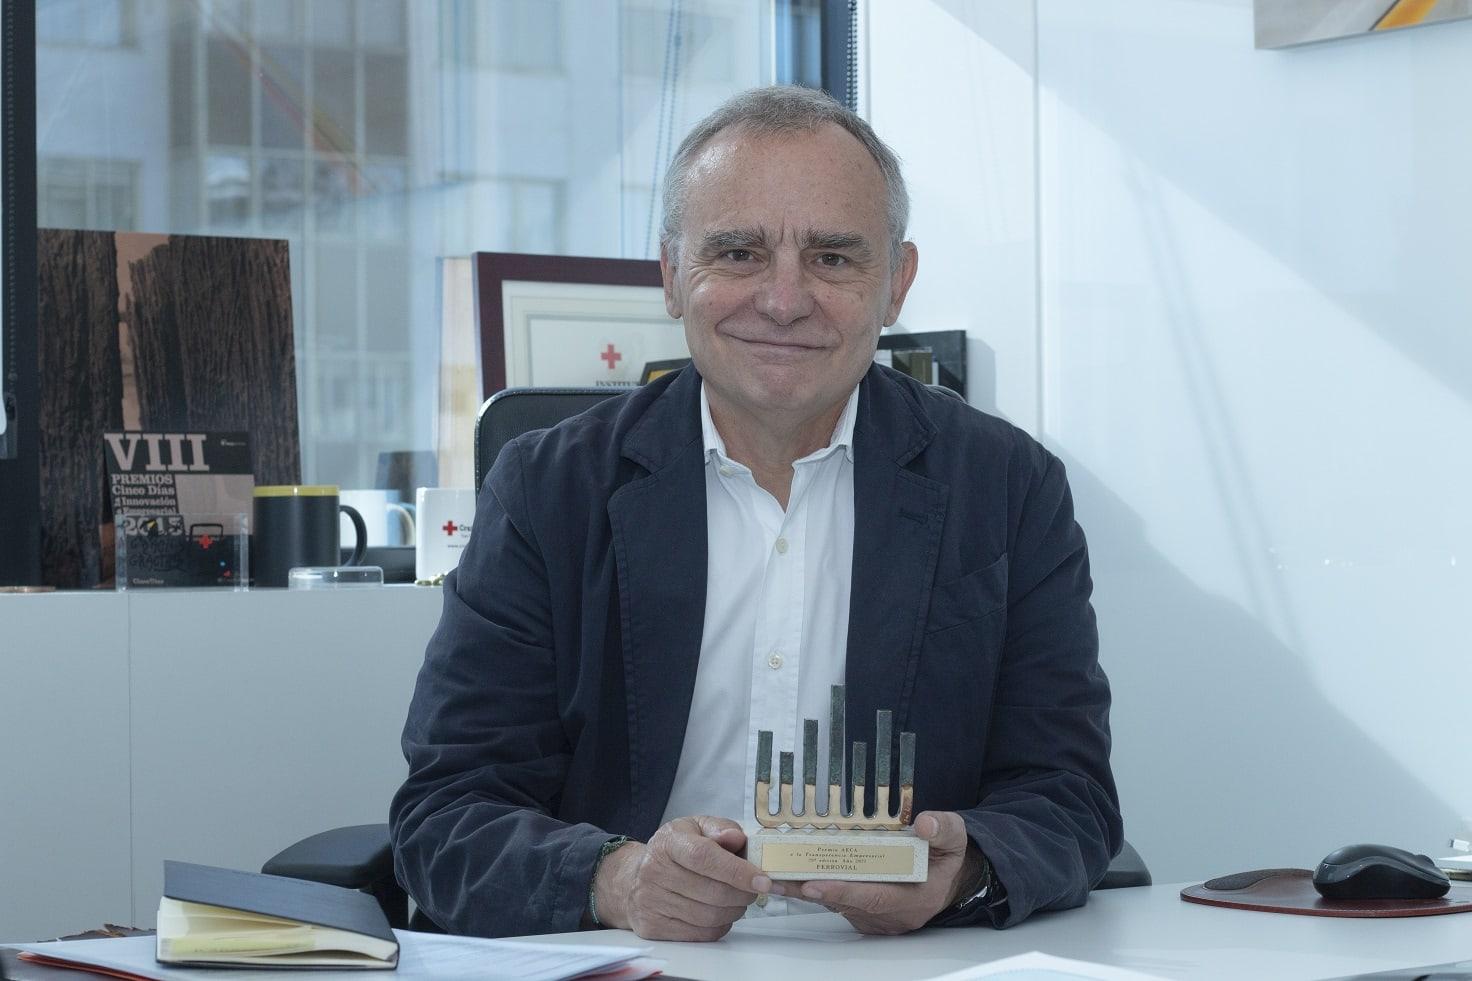 Ferrovial AECA Transparency Award